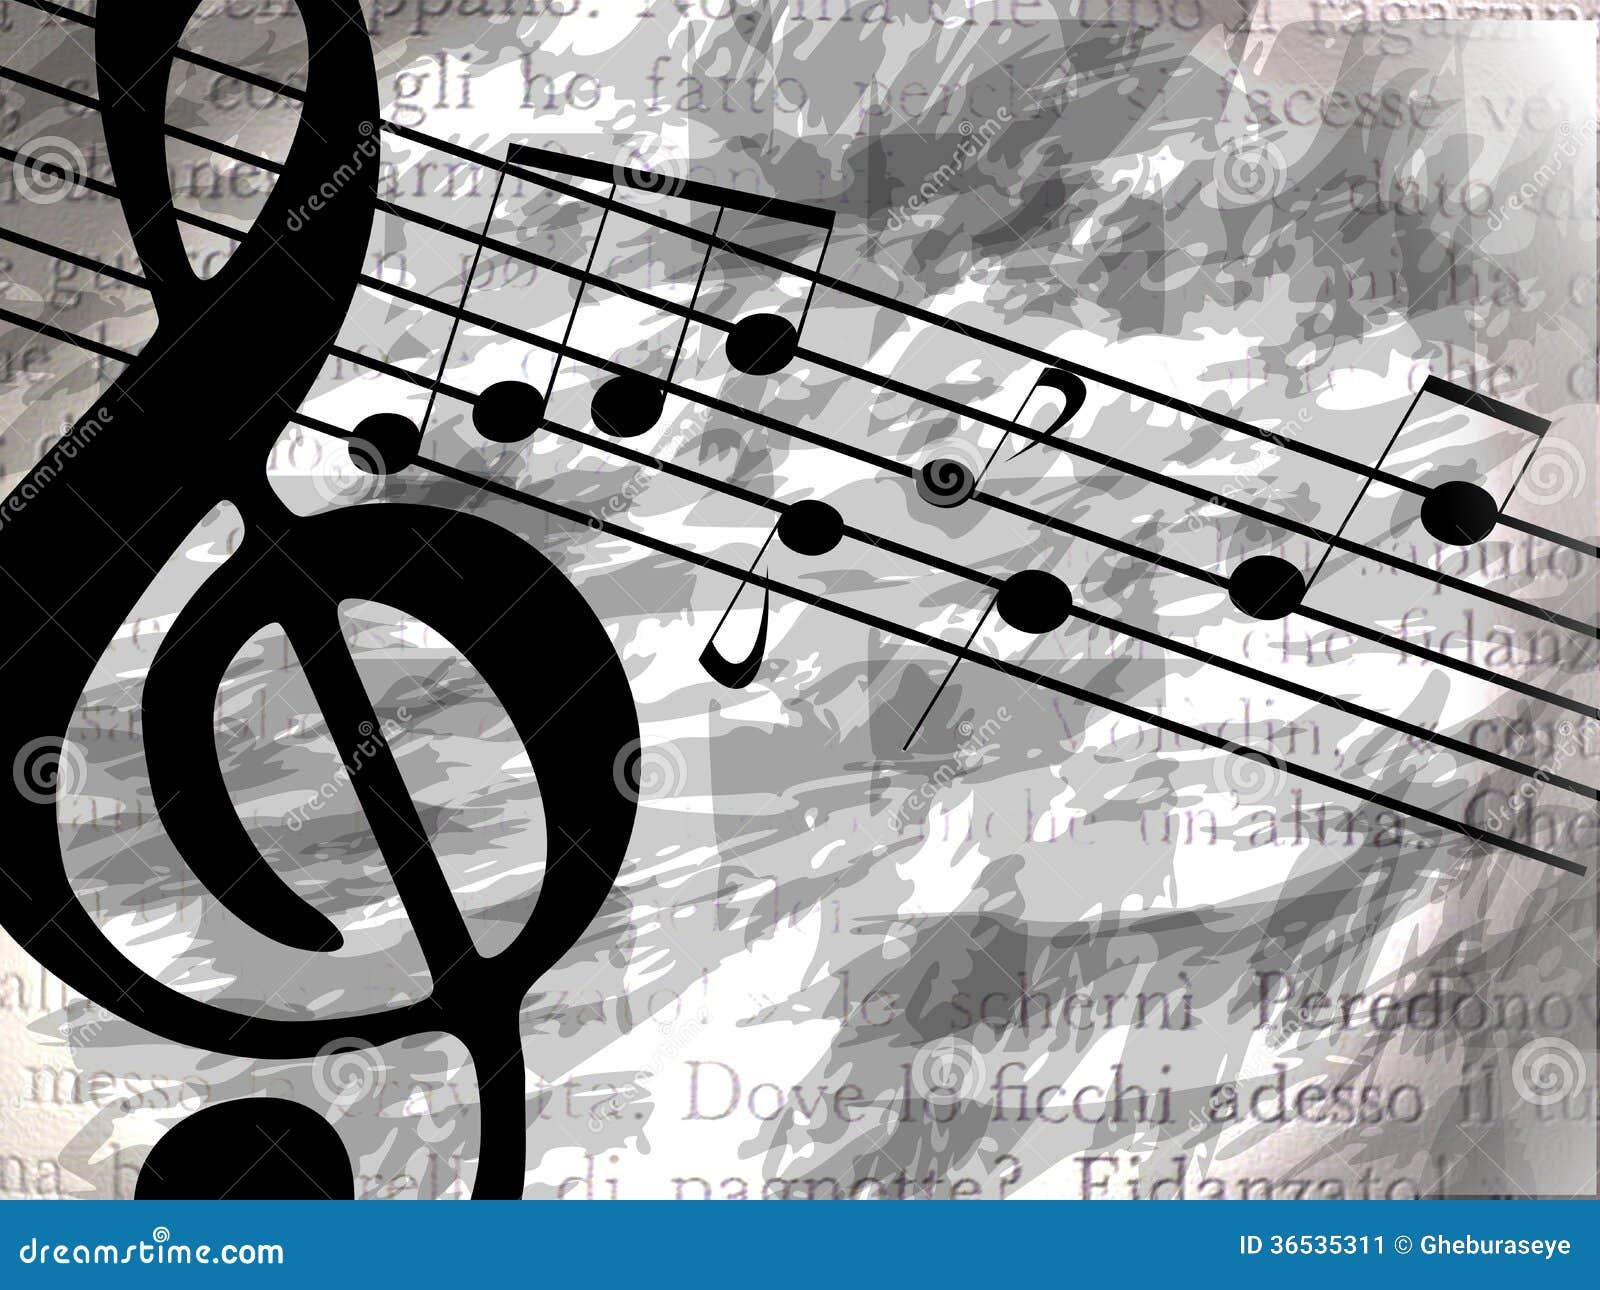 Amazing Musical Background With Notes Stock Image - Image: 36535311